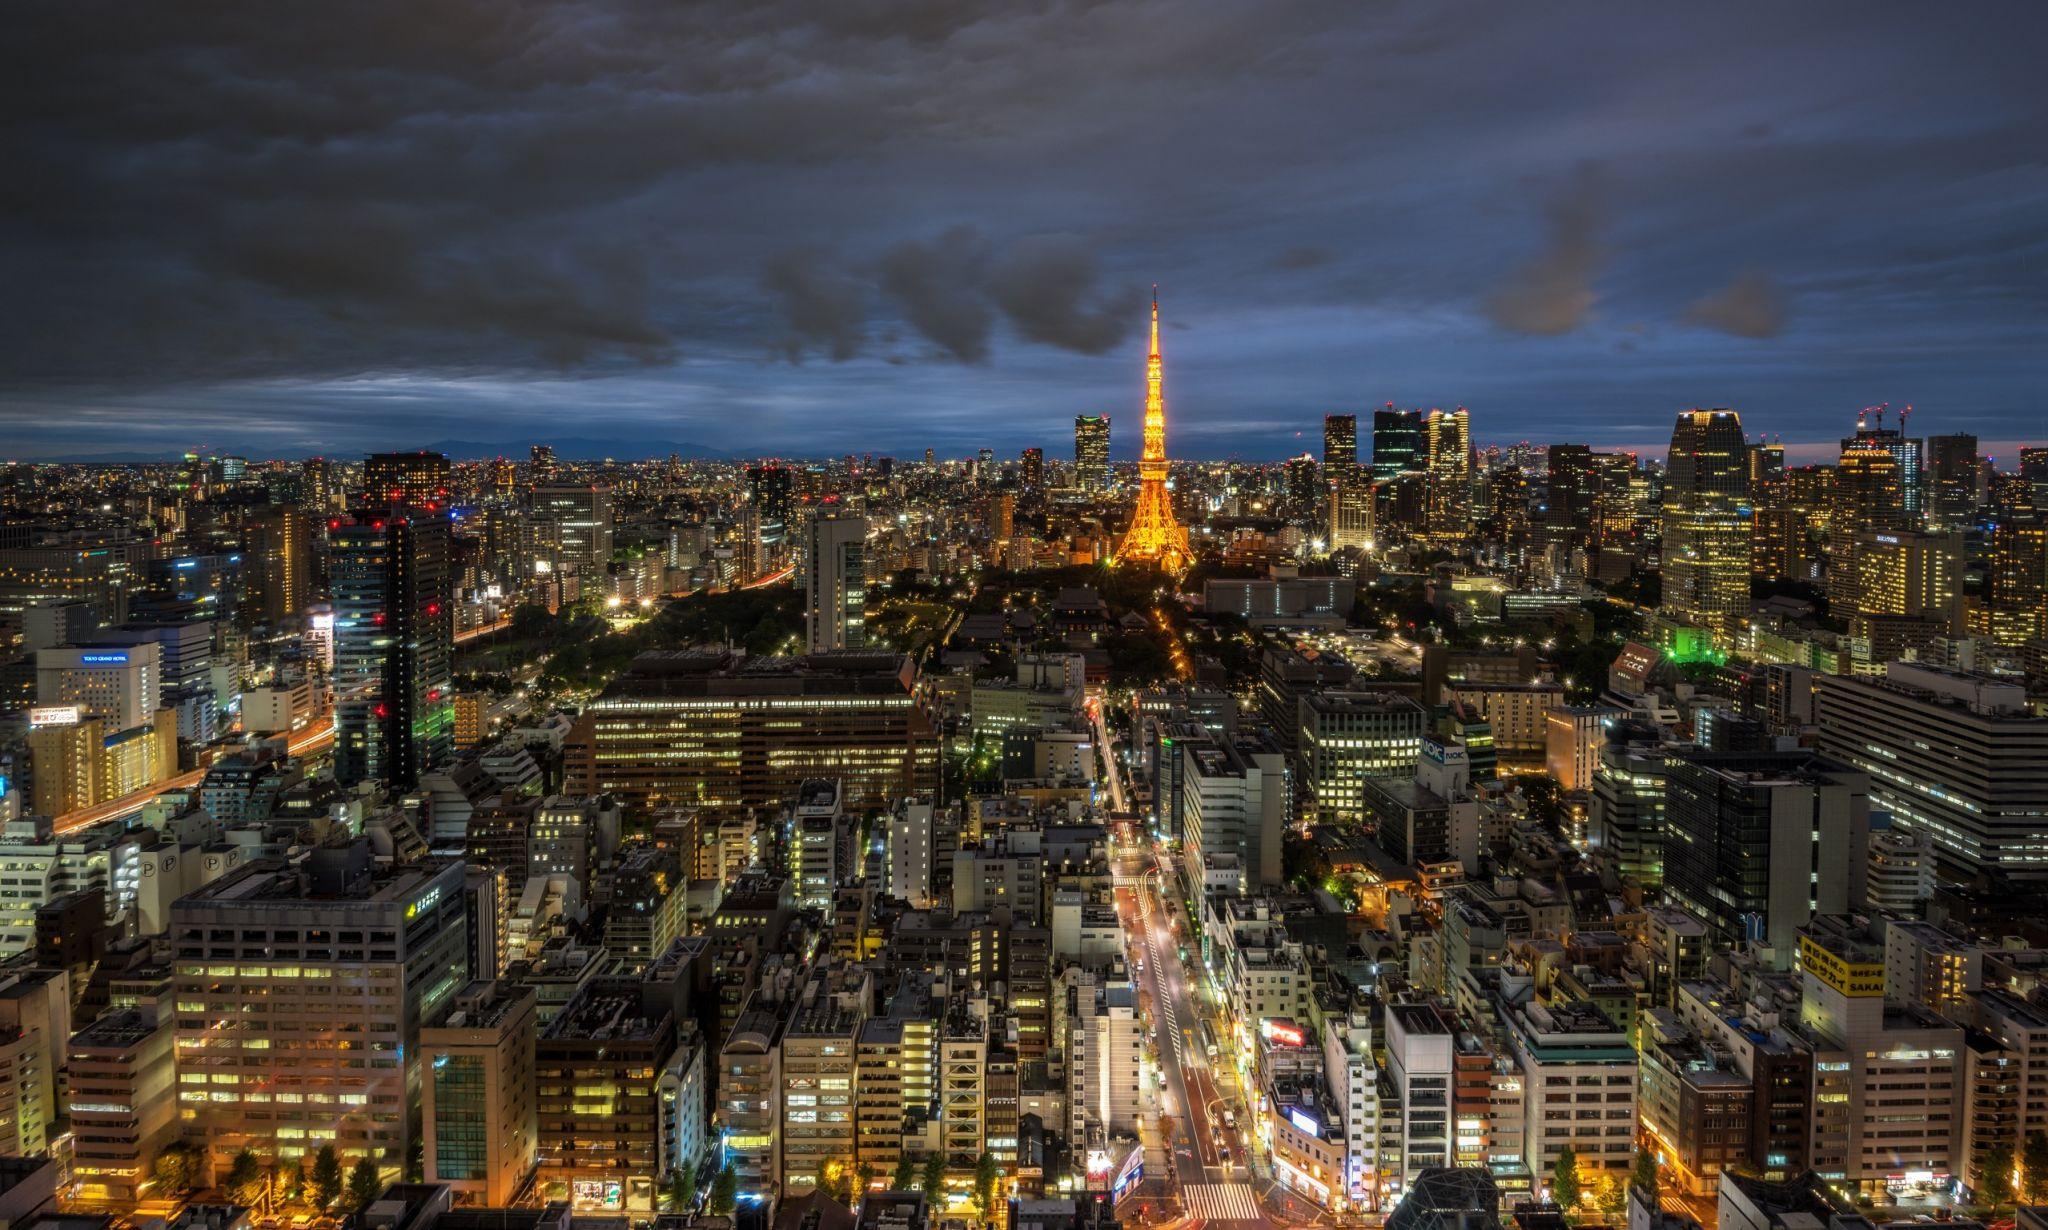 World Trade Center, Tokyo, Japan